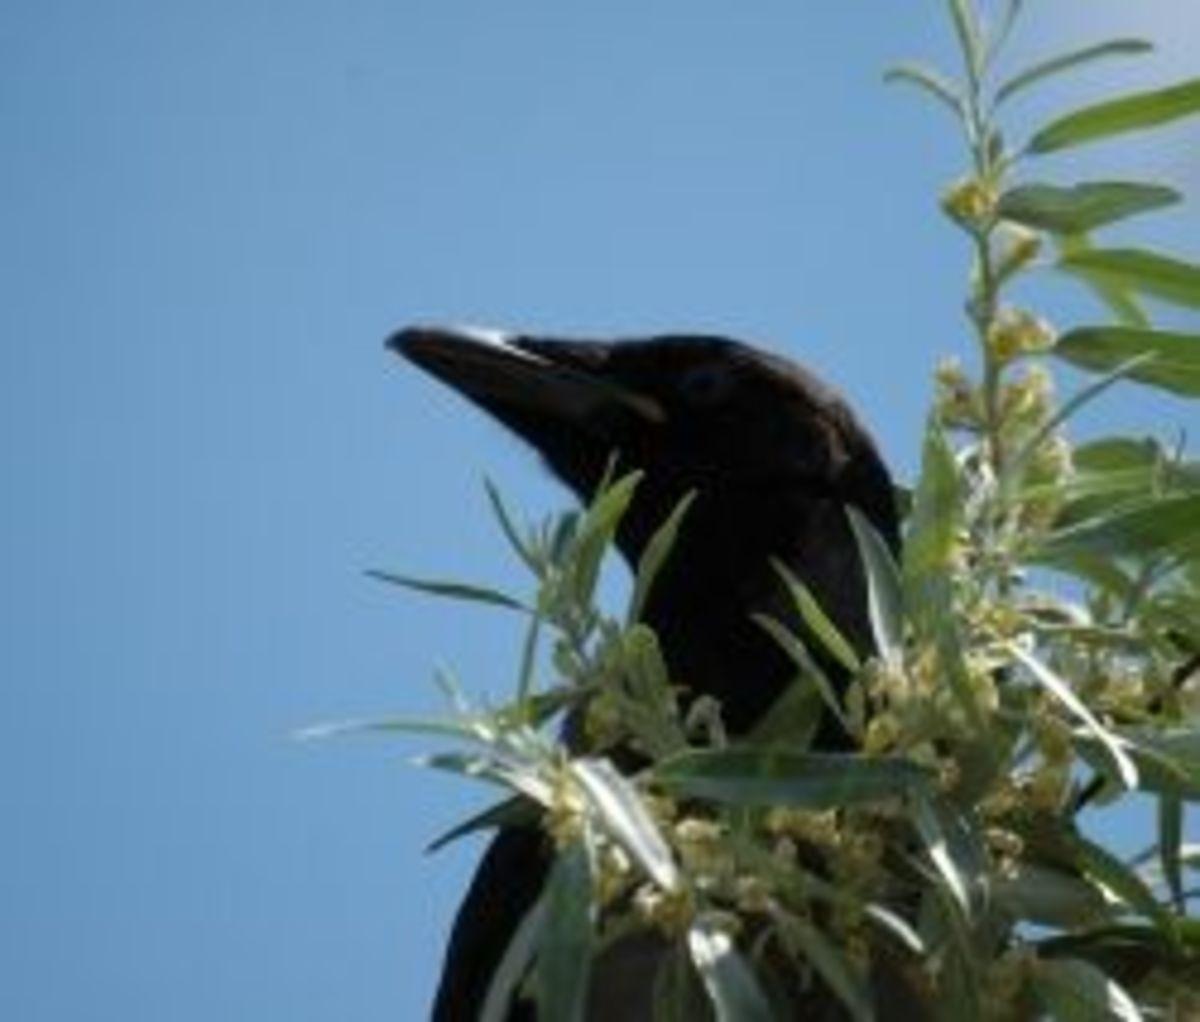 raven-symbolism-lore